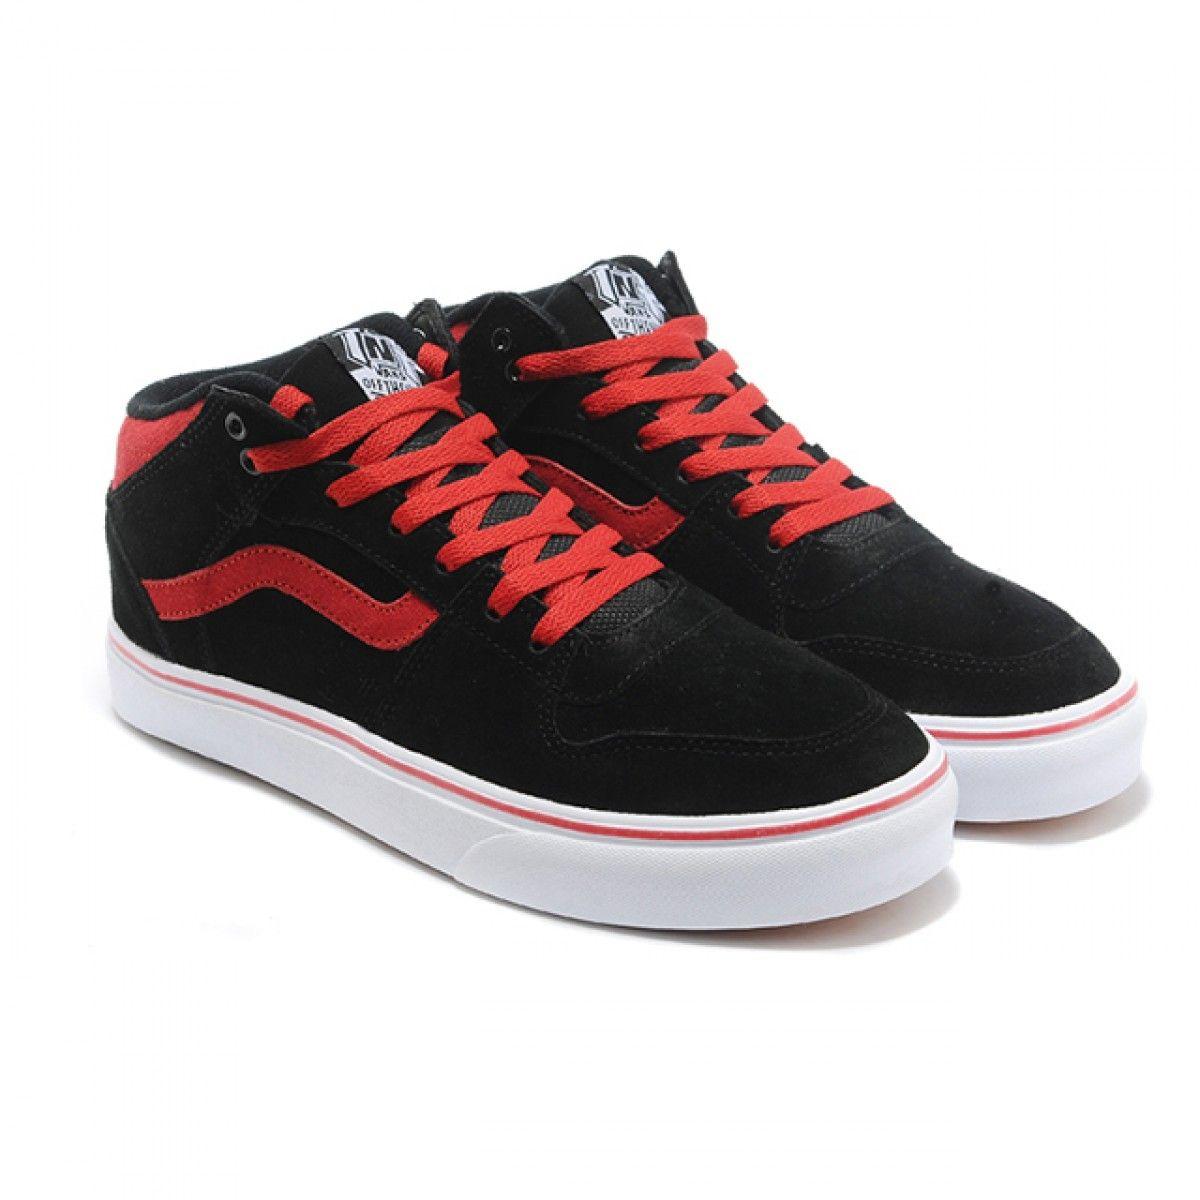 Vans Shoes Pink Platform Sk8-Hi Shoes Womens Classic Leather ...